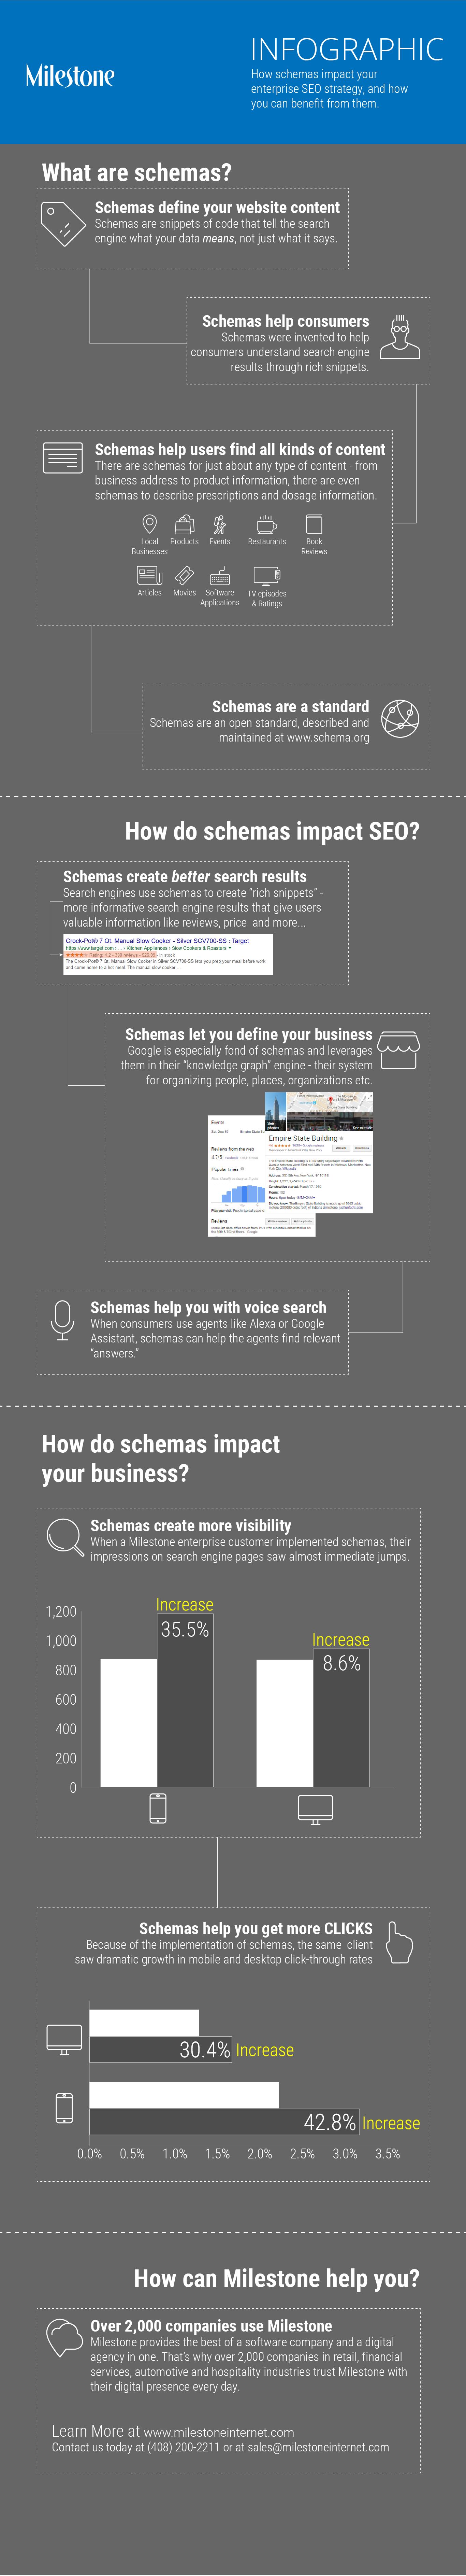 schema seo infographic2 01